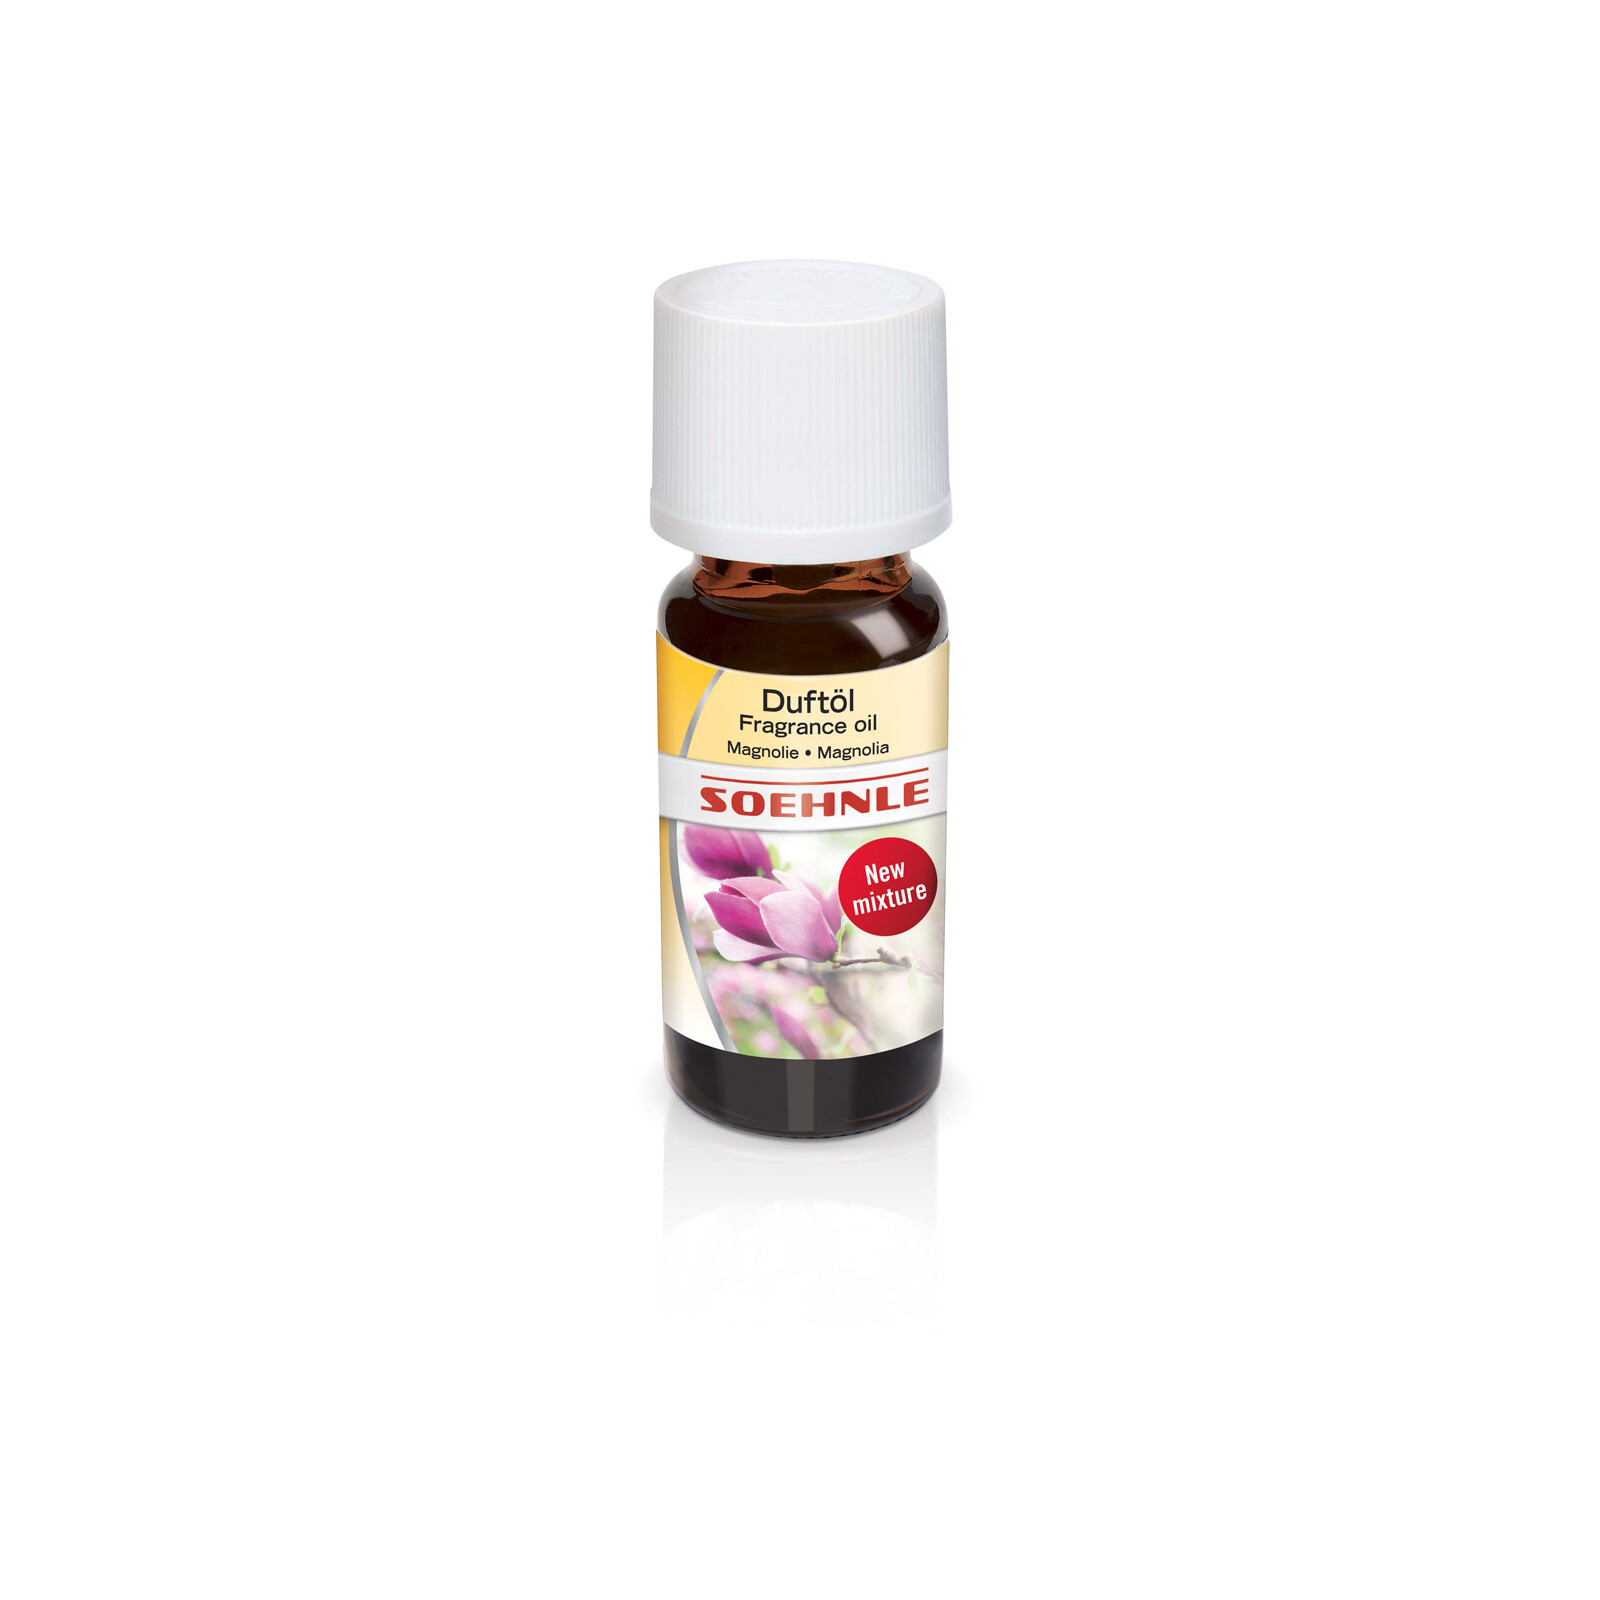 Soehnle Duftöl Magnolia